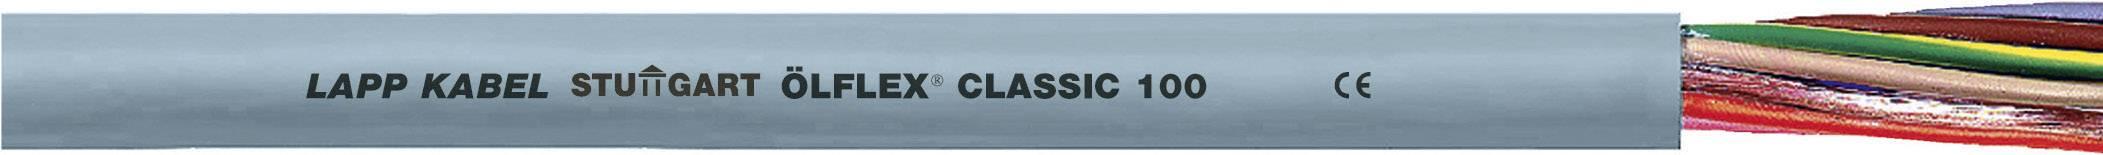 Kabel LappKabel Ölflex CLASSIC 100 5X0,5 (00101244), PVC, 6,2 mm, 500 V, šedá, 50 m